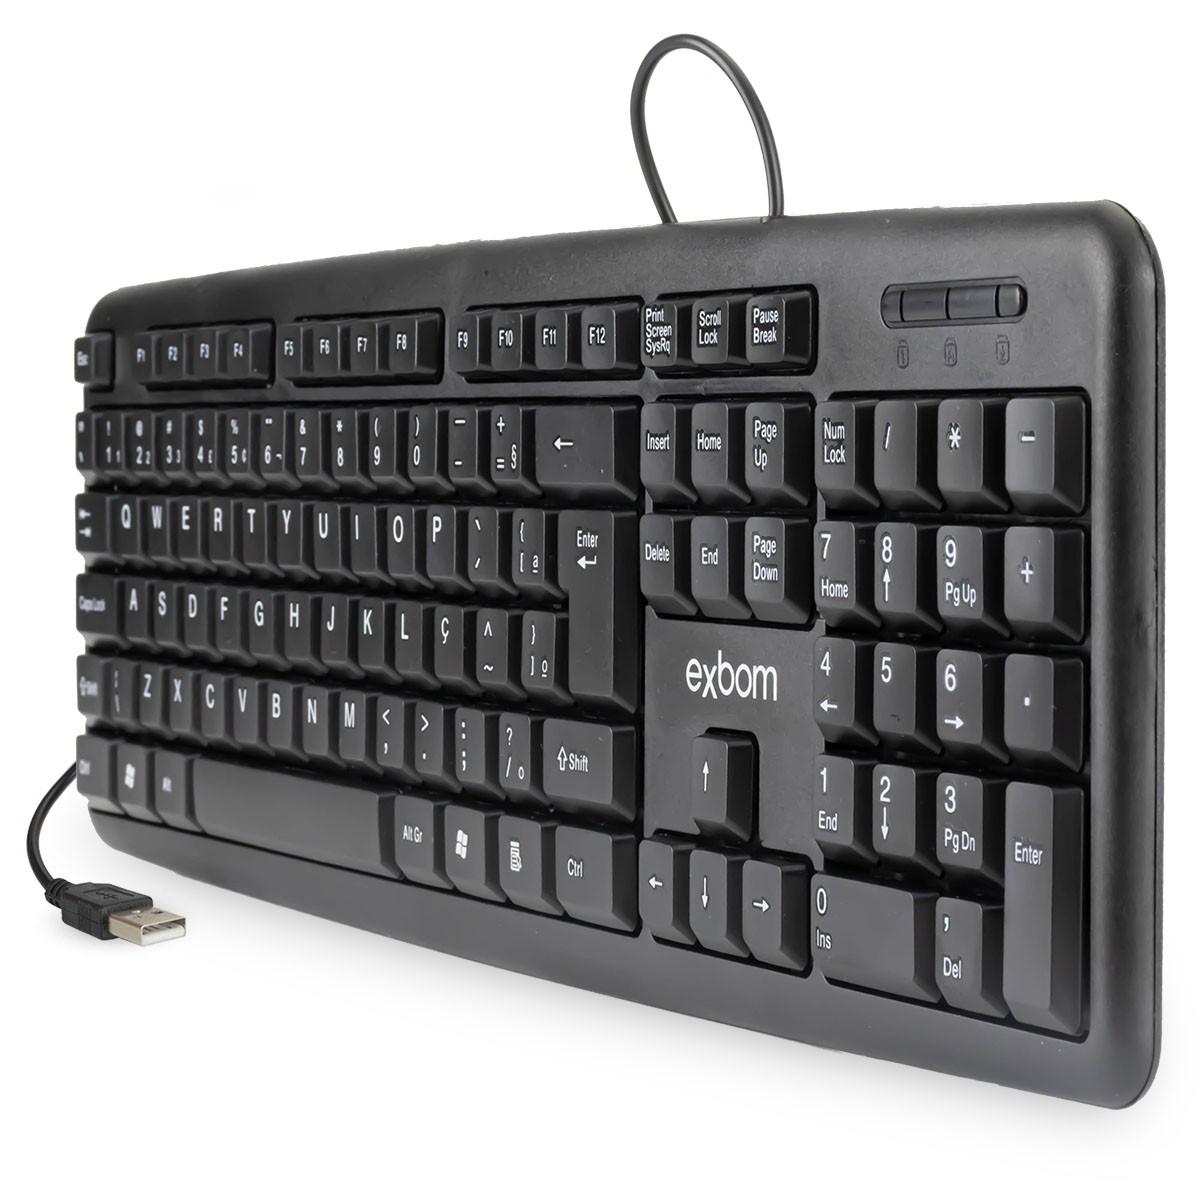 Teclado USB Standard Padrão ABNT 2 (Com Ç) 107 Teclas Exbom BK-102